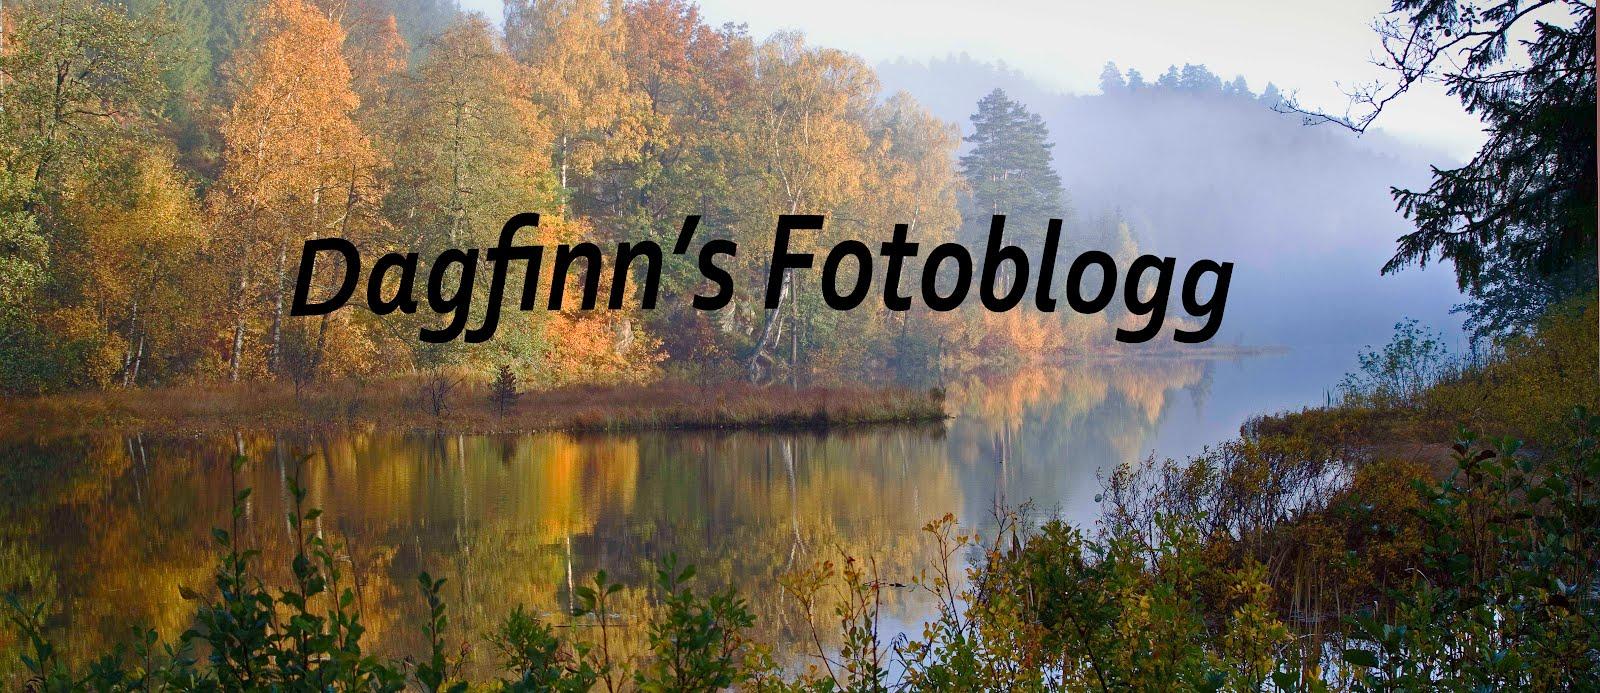 Dagfinn's fotoblogg